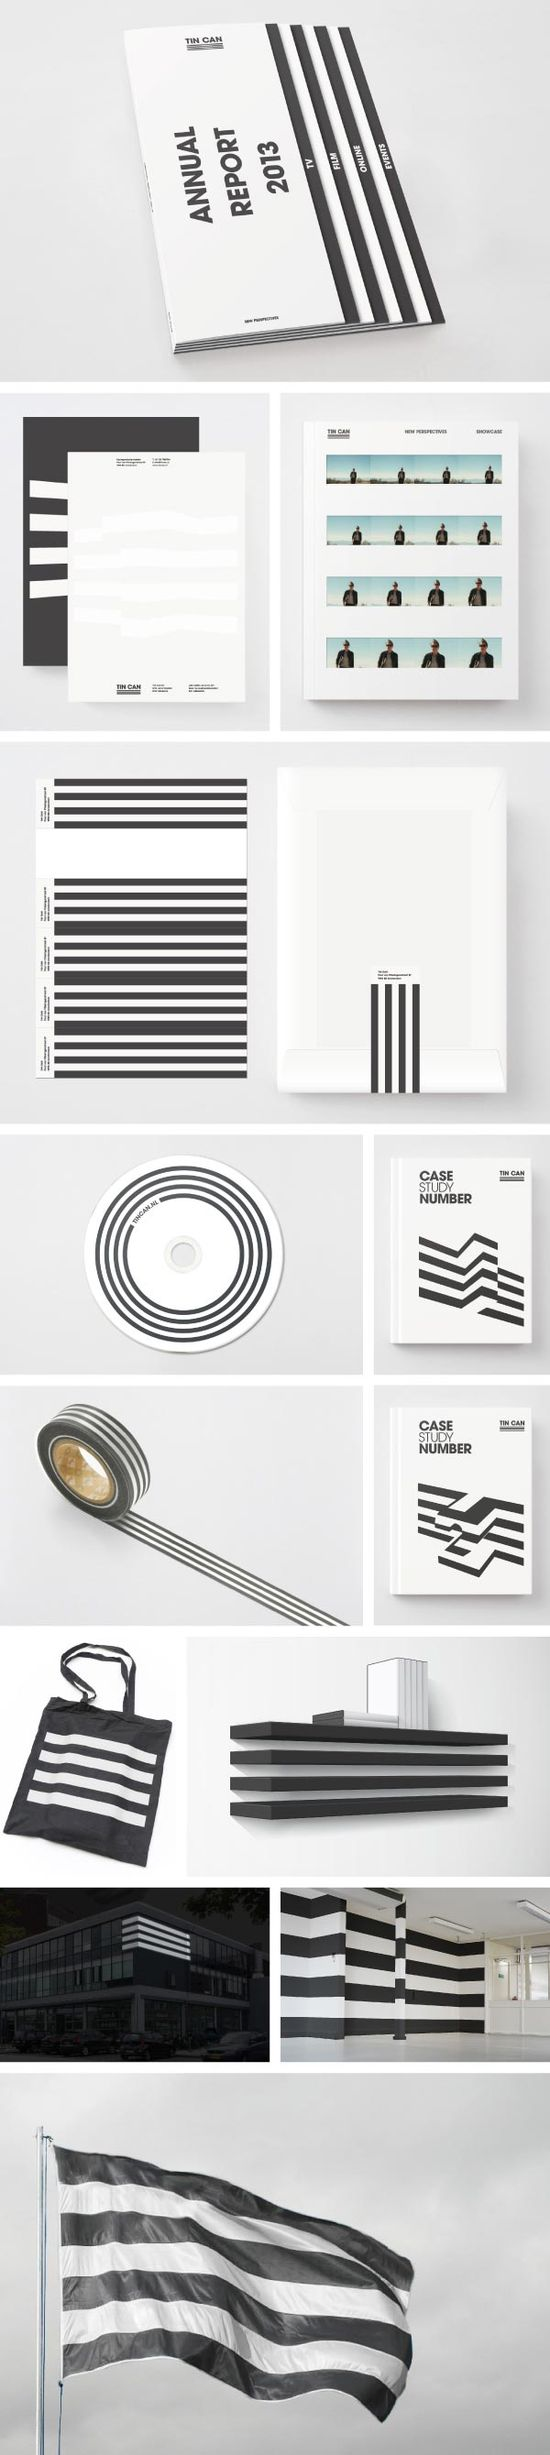 TIN CAN Identity - graphic design by Leon Dijkstra